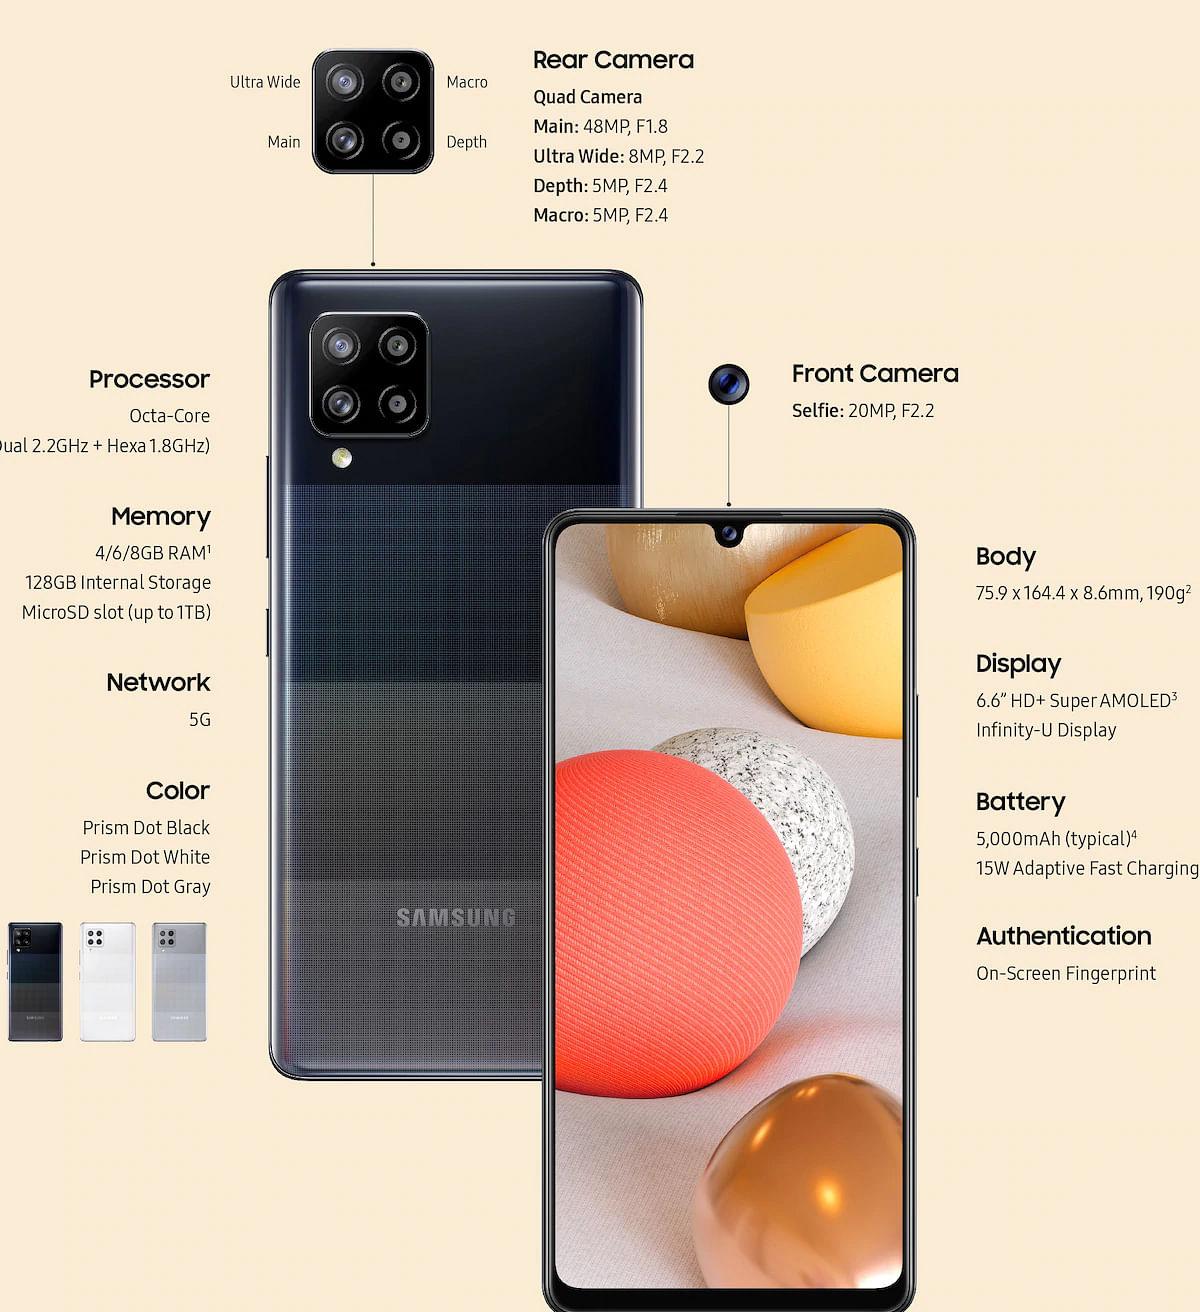 Samsung Galaxy A42 5G specs details